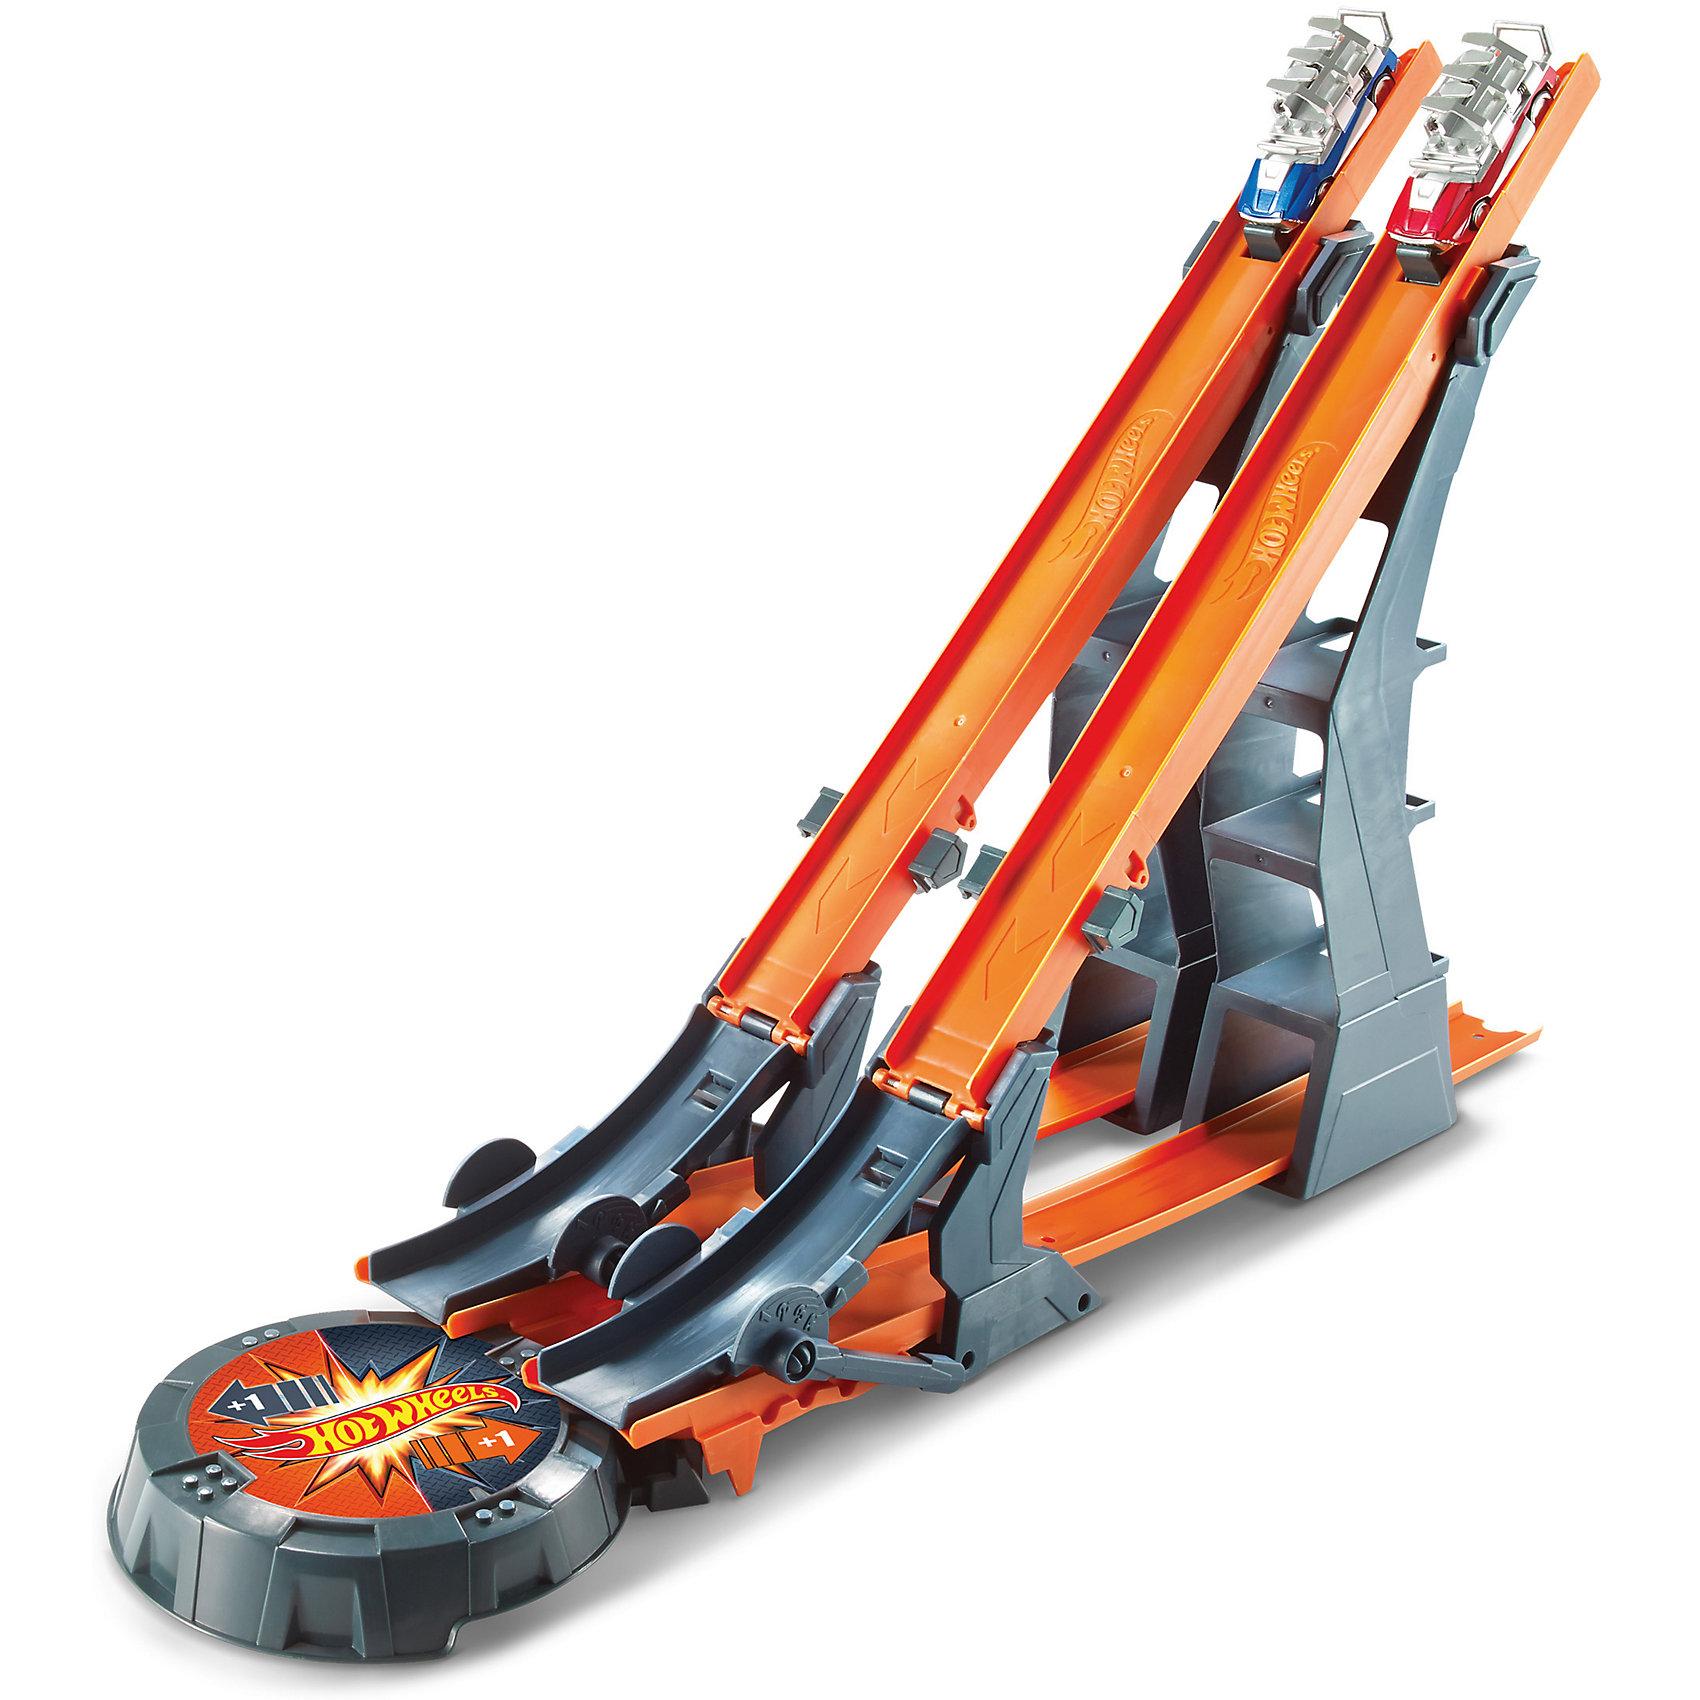 Mattel Трасса Супер гравитация, Hot Wheels hot wheels dhy27 трасса для разделяющих гонщиков split speeders blade raid